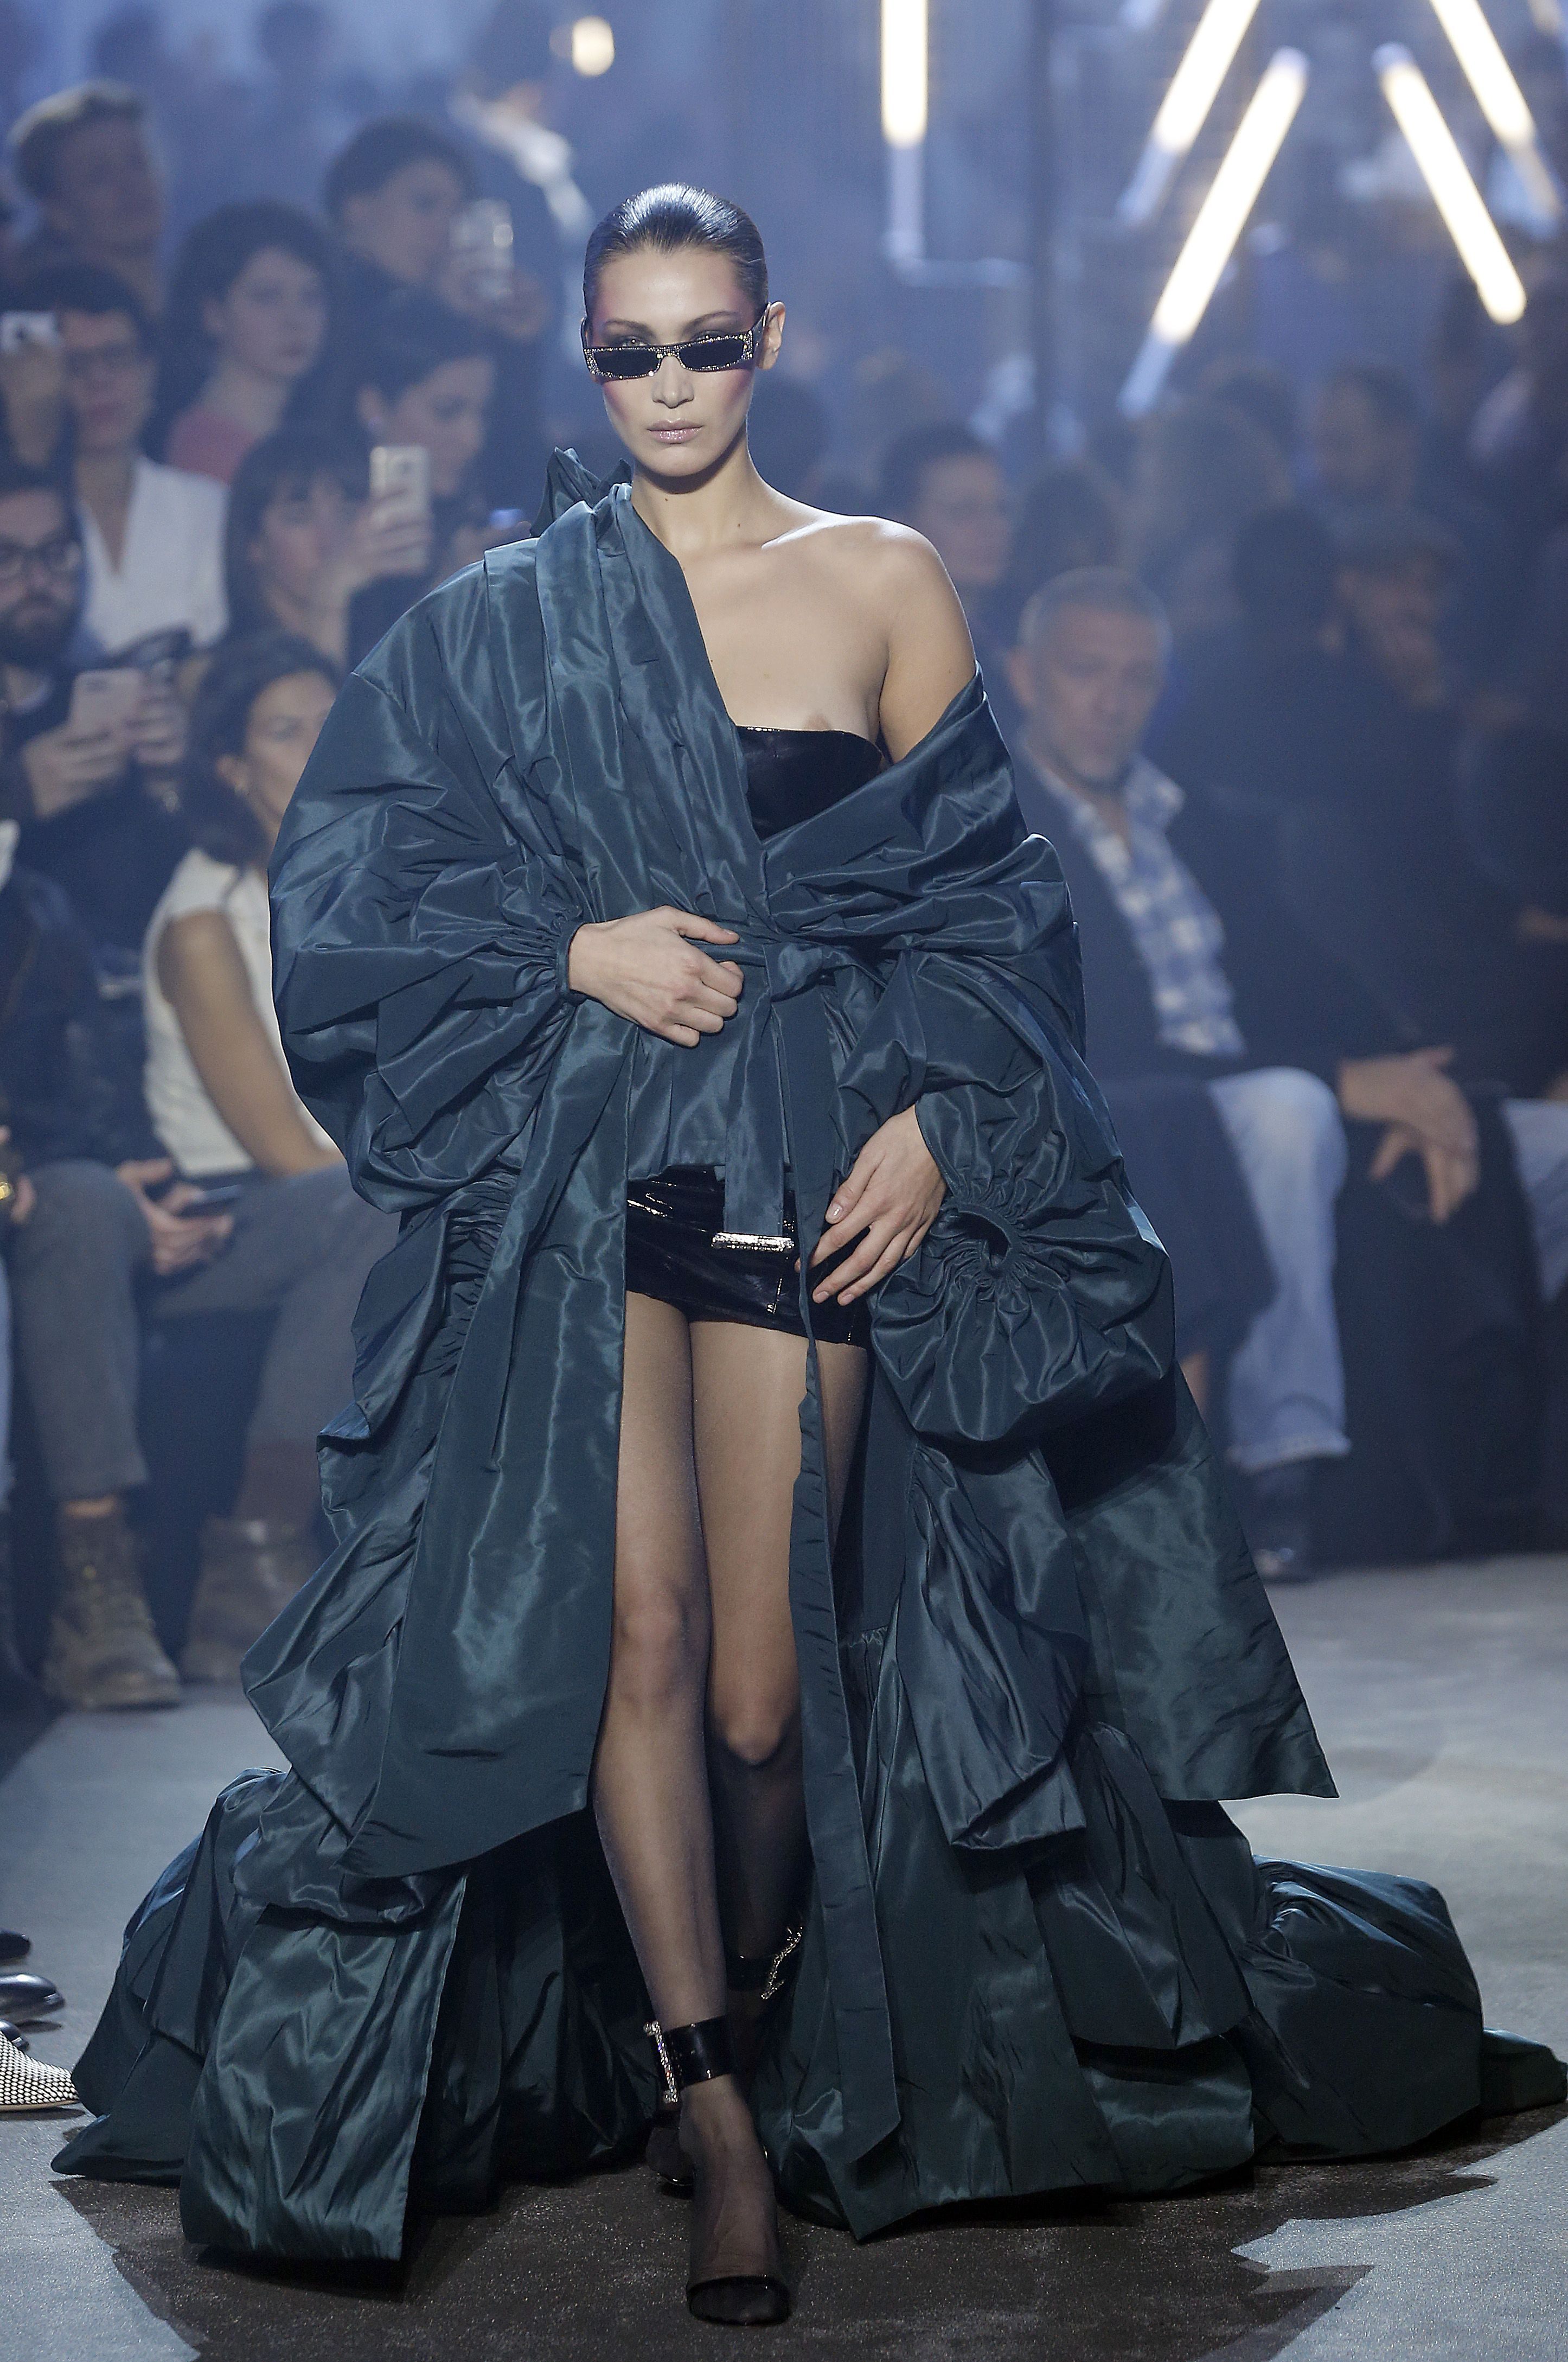 Fashion Nip Slips